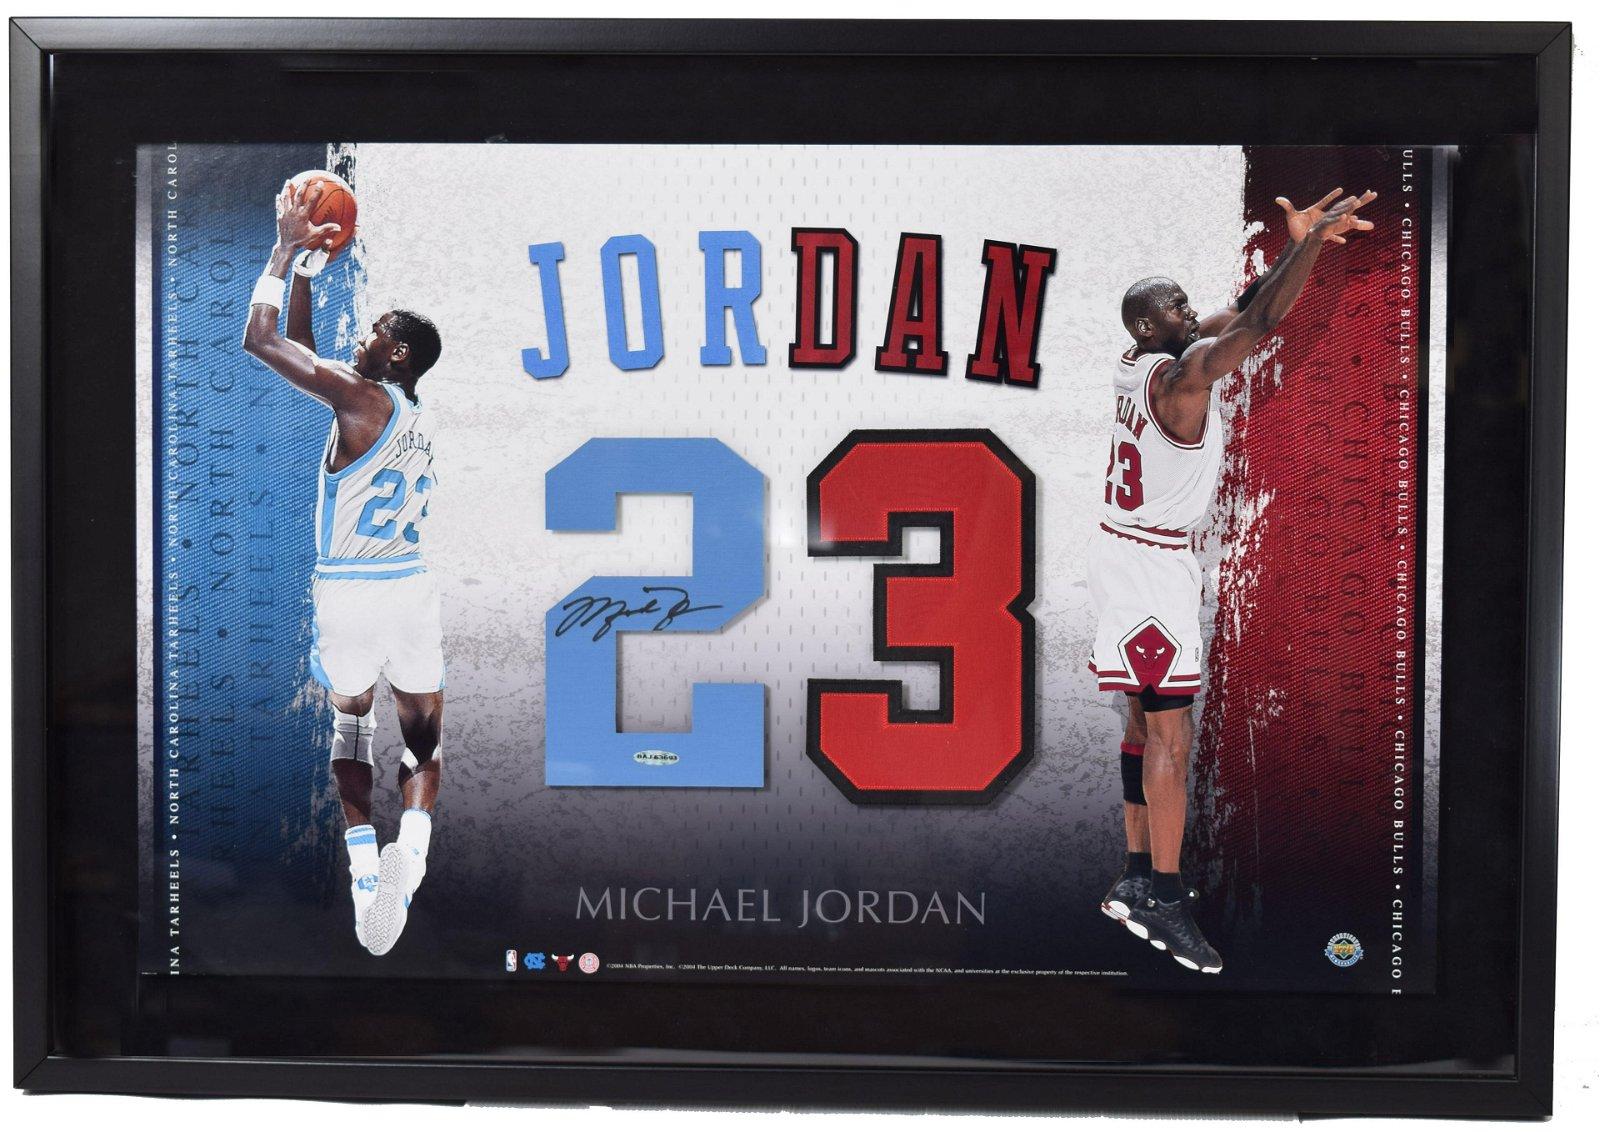 Michael Jordan Signed Upper Deck Display Piece